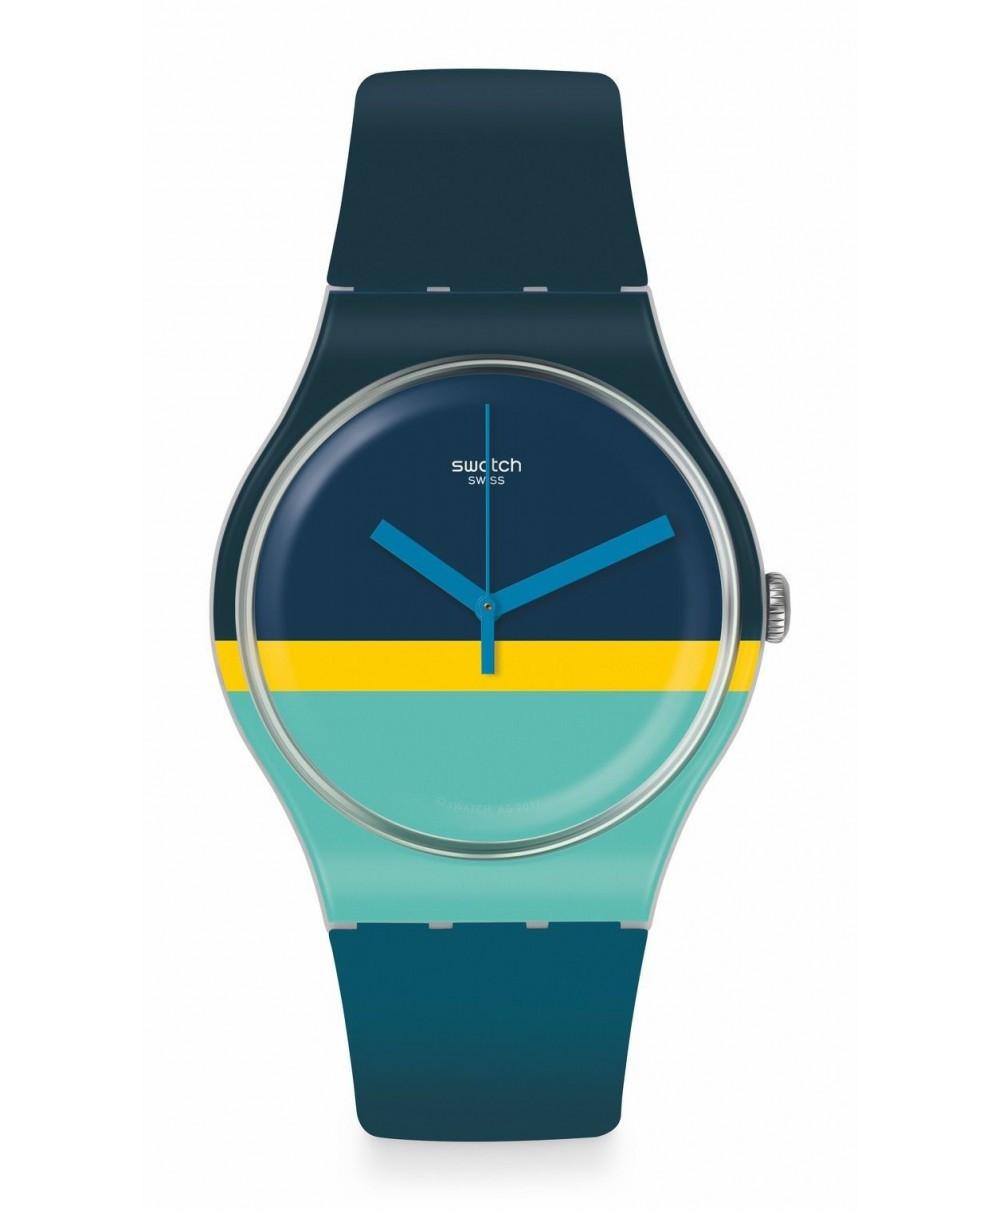 Reloj Swatch Ment heure SUOW154